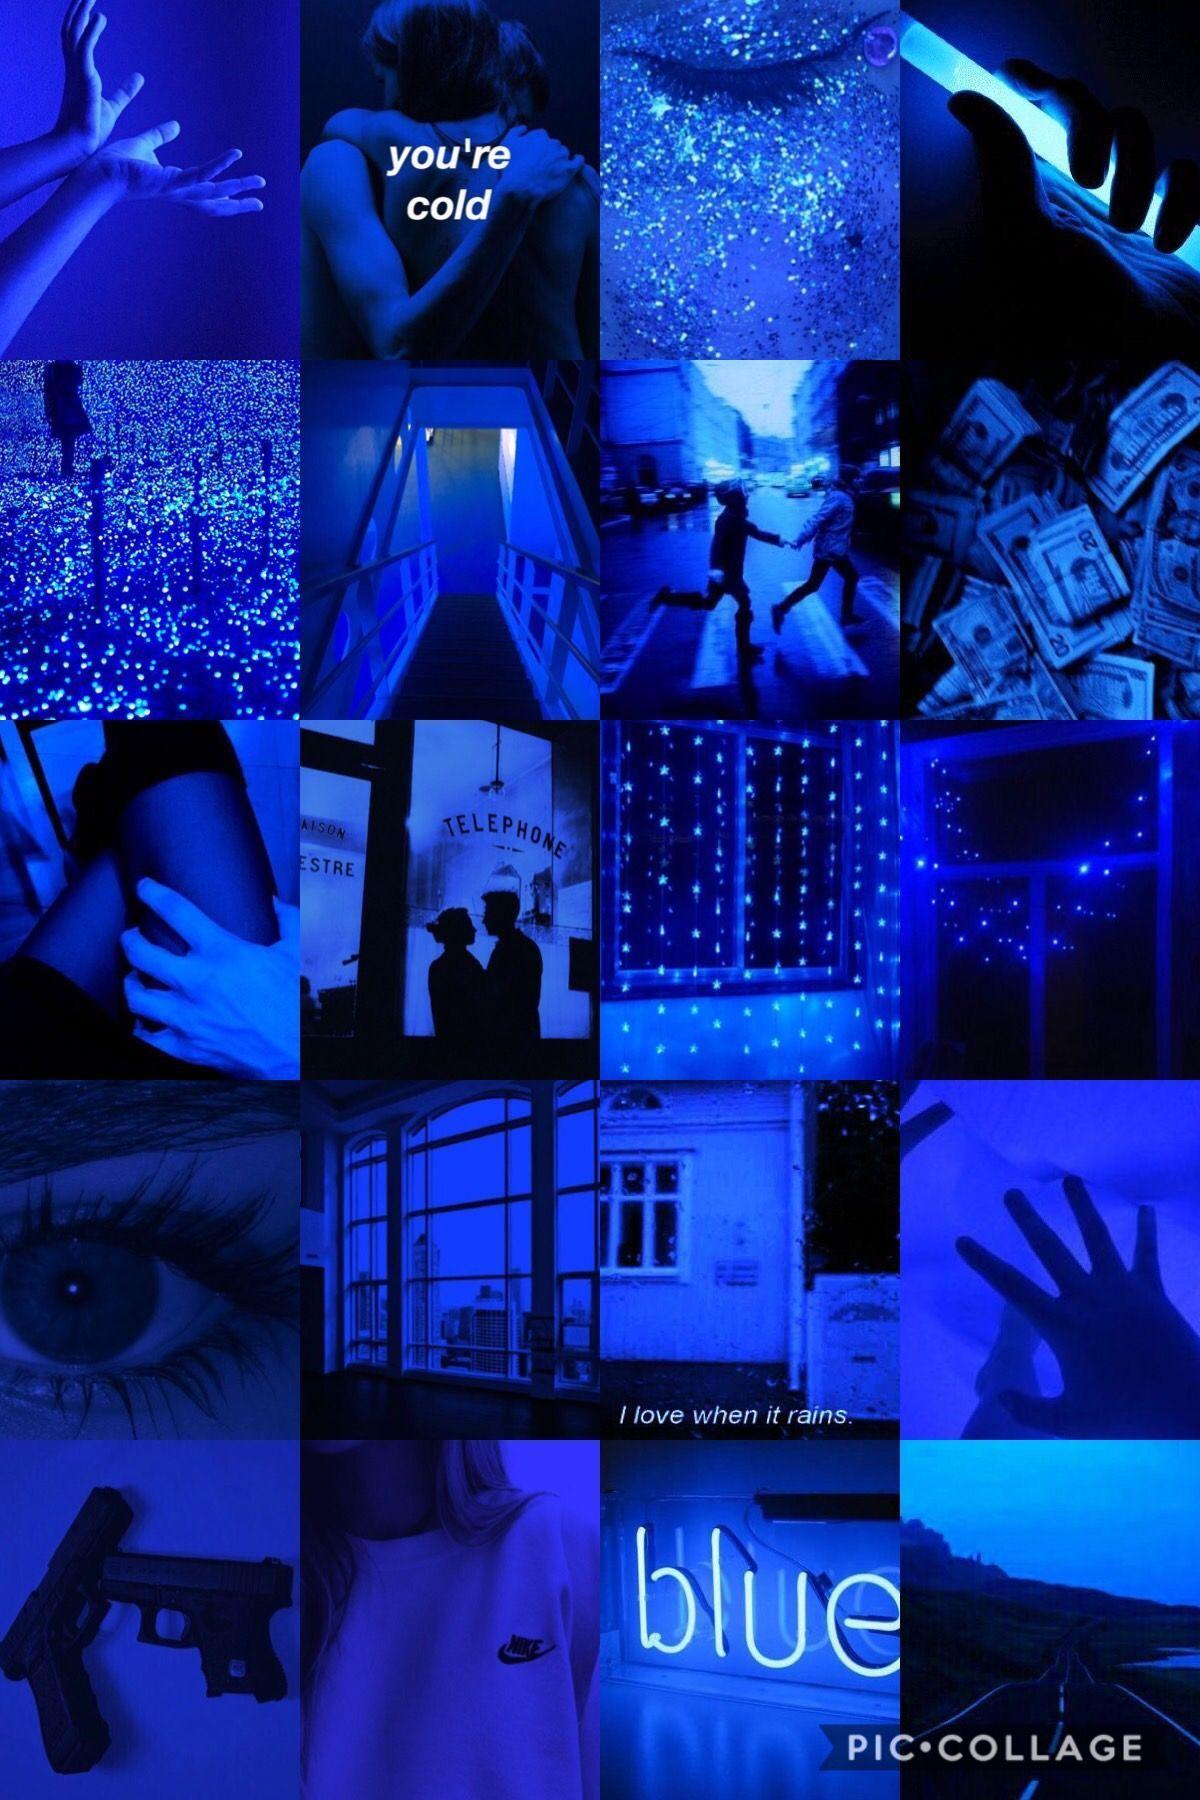 Aesthetic Wallpapers Dark Blue Blue Aesthetic Tumblr Black Aesthetic Wallpaper Blue Wallpaper Iphone